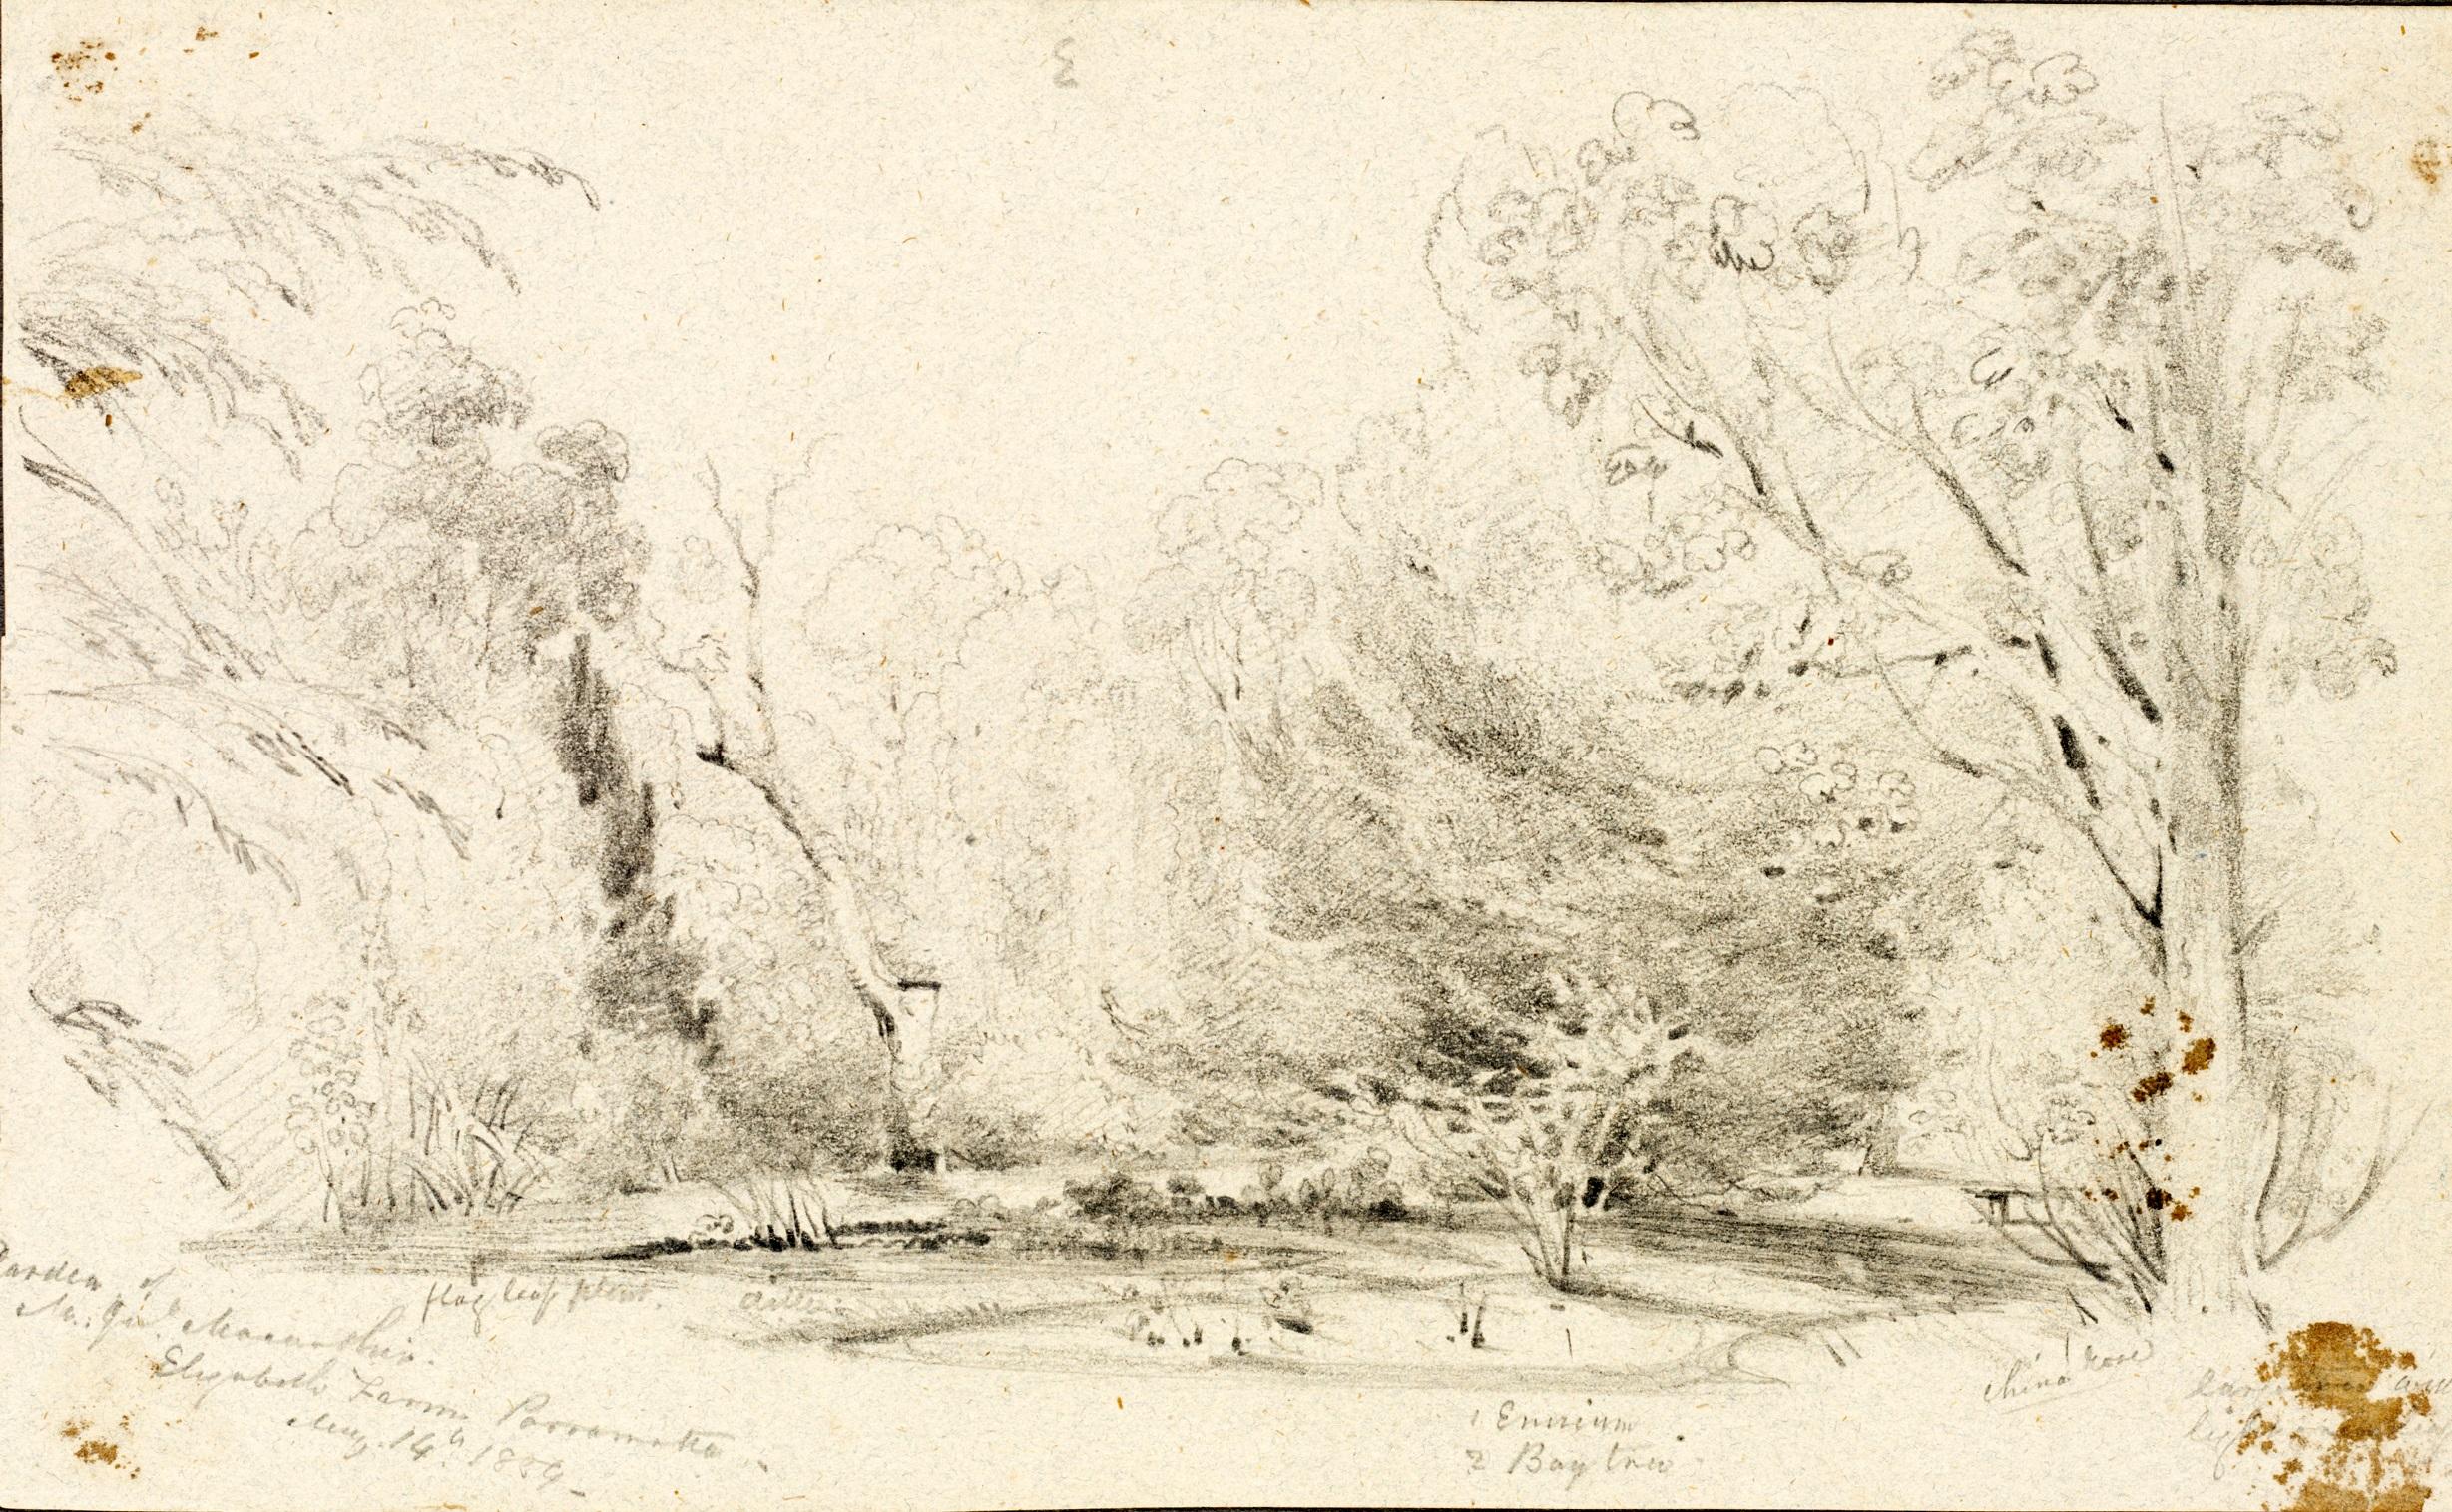 Parramatta ElizabethFarm CMartin 1859 Pencil SLNSW